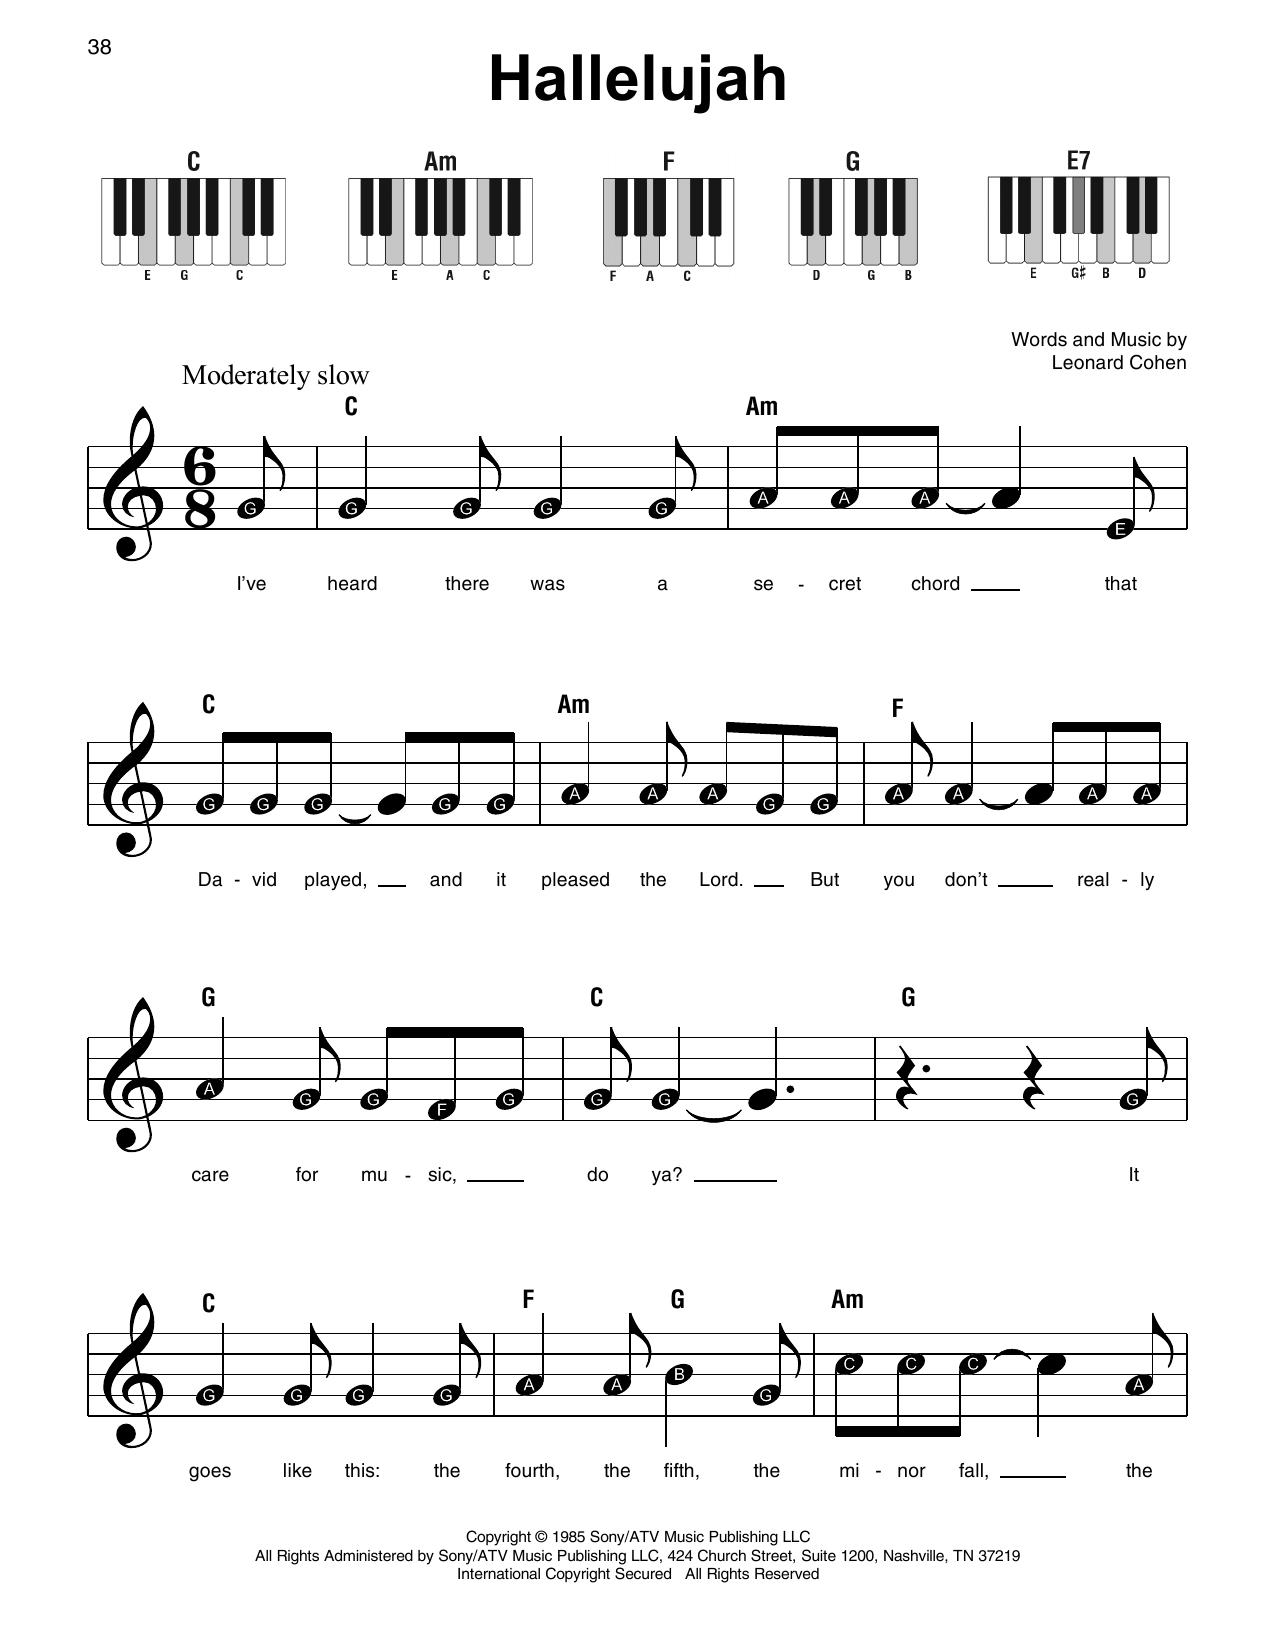 Hallelujah Sheet Music | Leonard Cohen | Super Easy Piano - Free Printable Piano Sheet Music For Hallelujah By Leonard Cohen